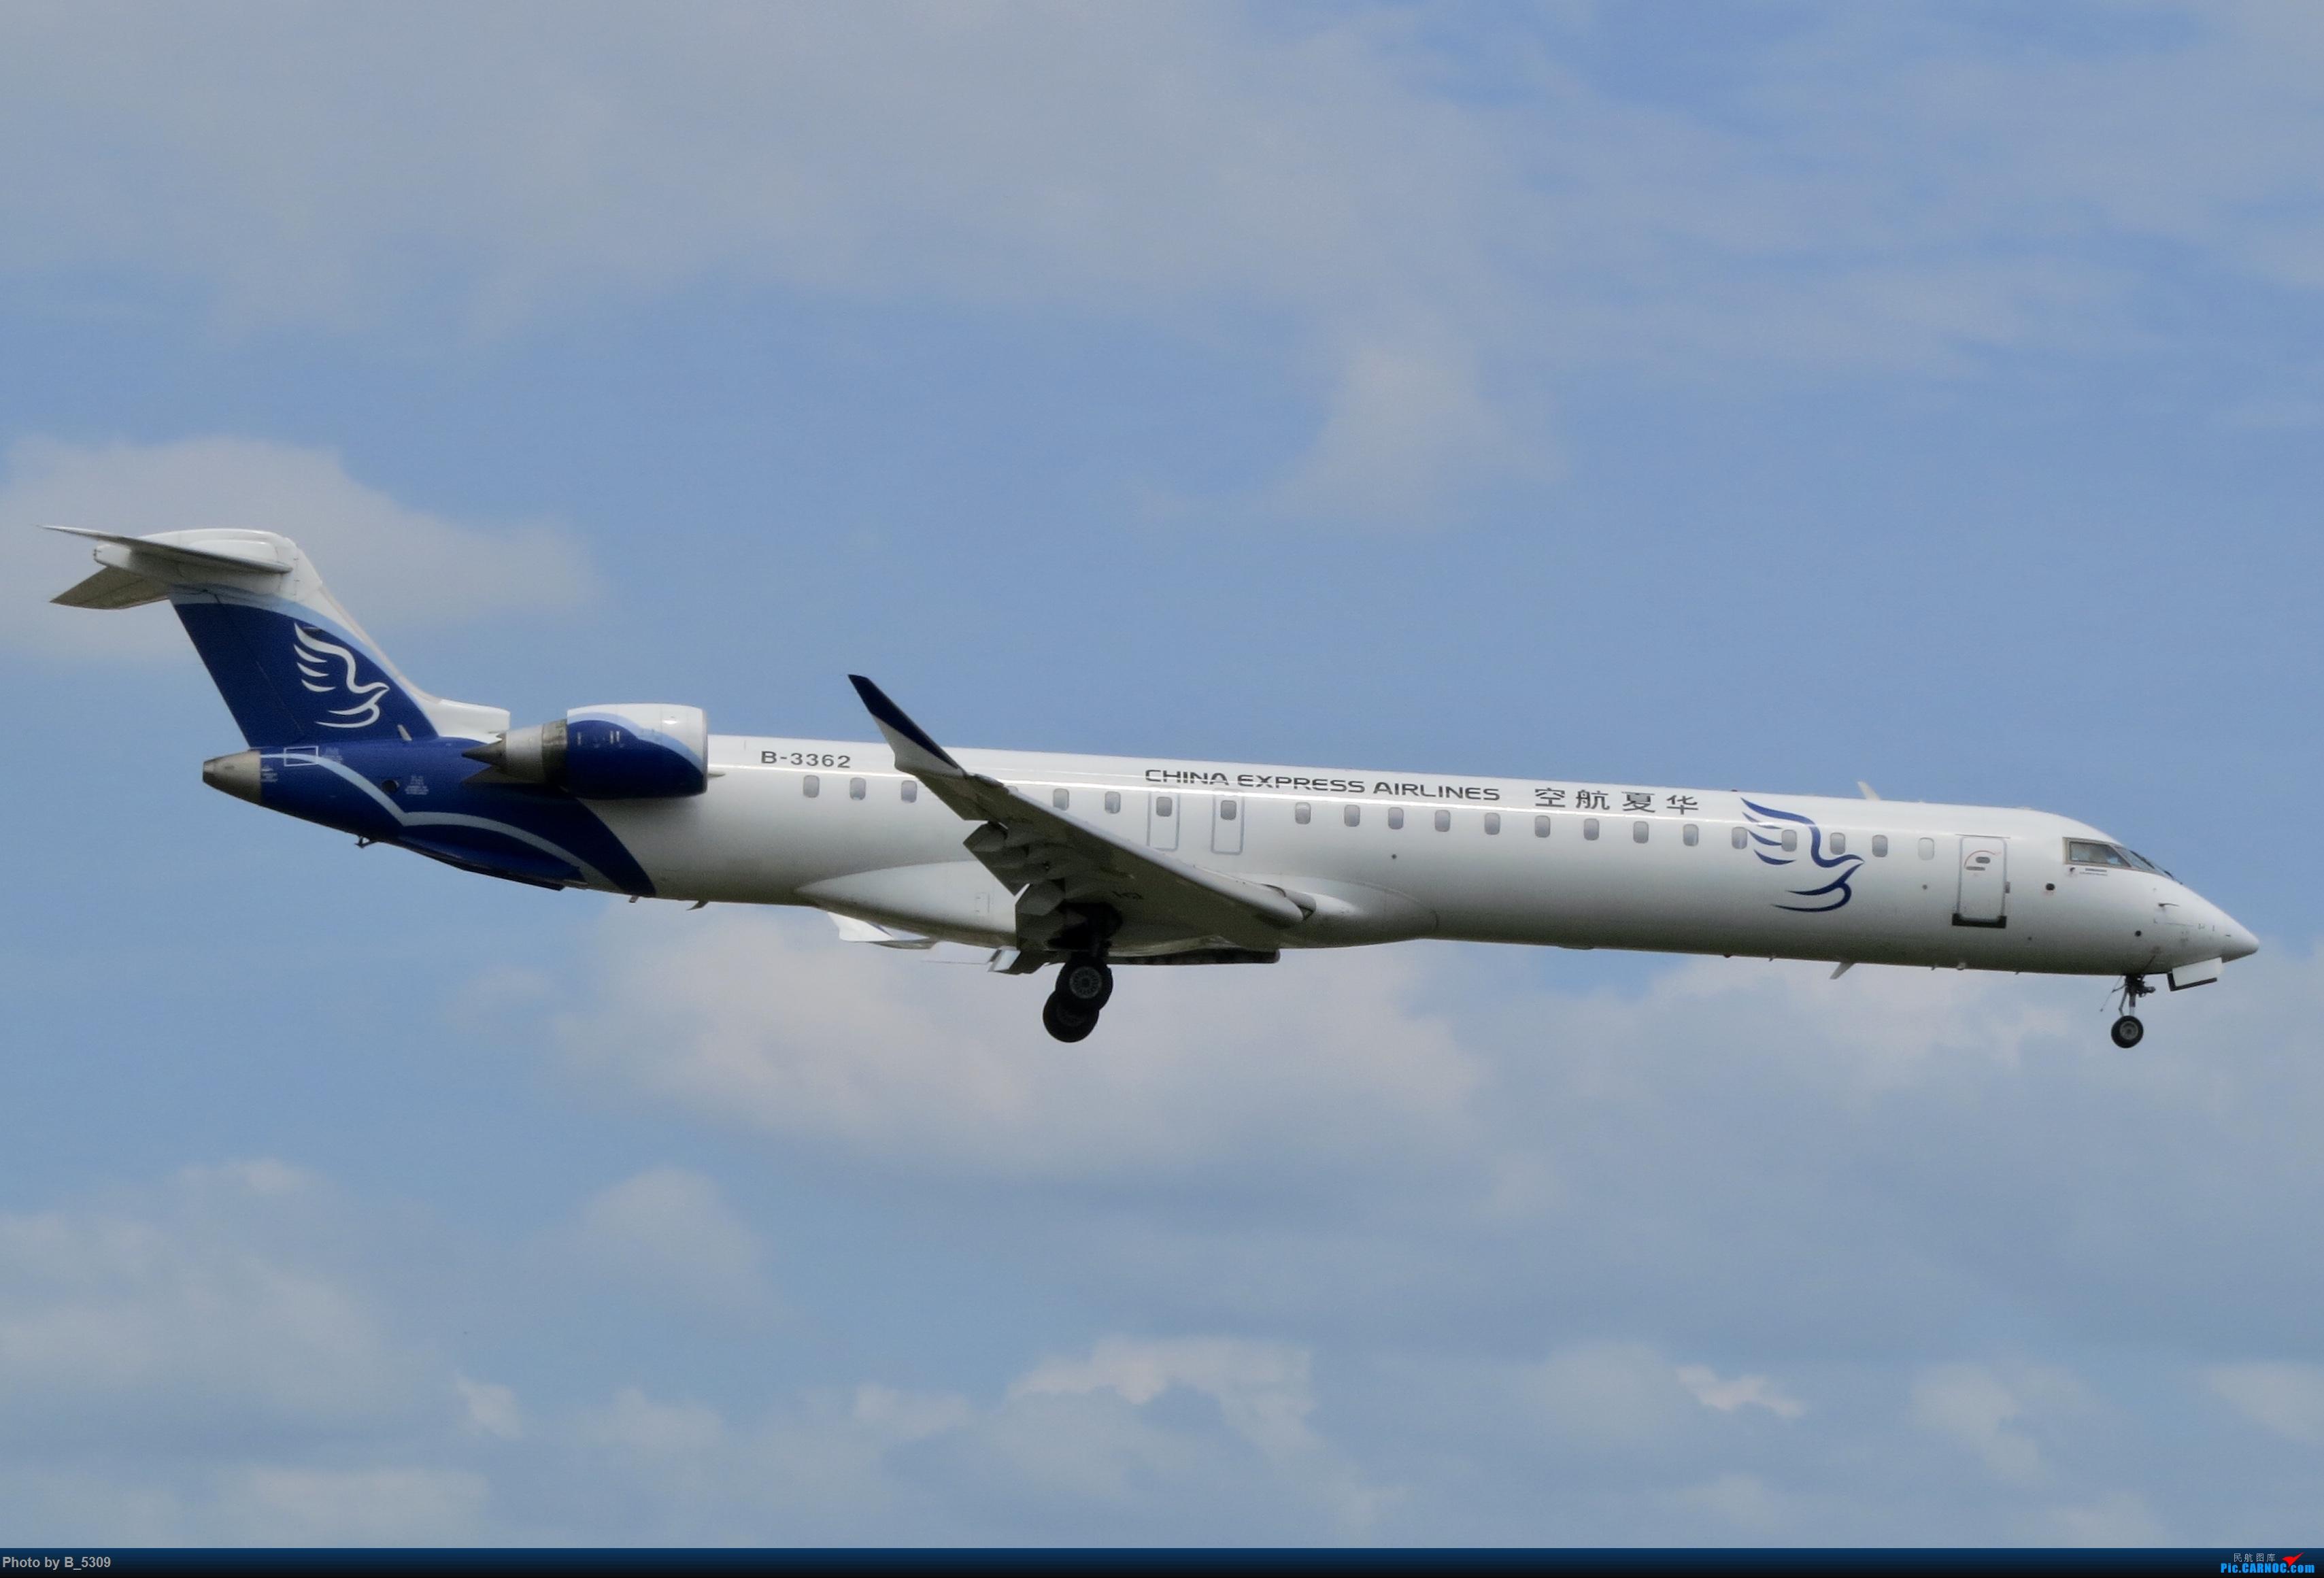 Re:[原创]白鹭窝终于换向了。。。 BOMBARDIER CRJ900NG B-3362 中国厦门高崎国际机场